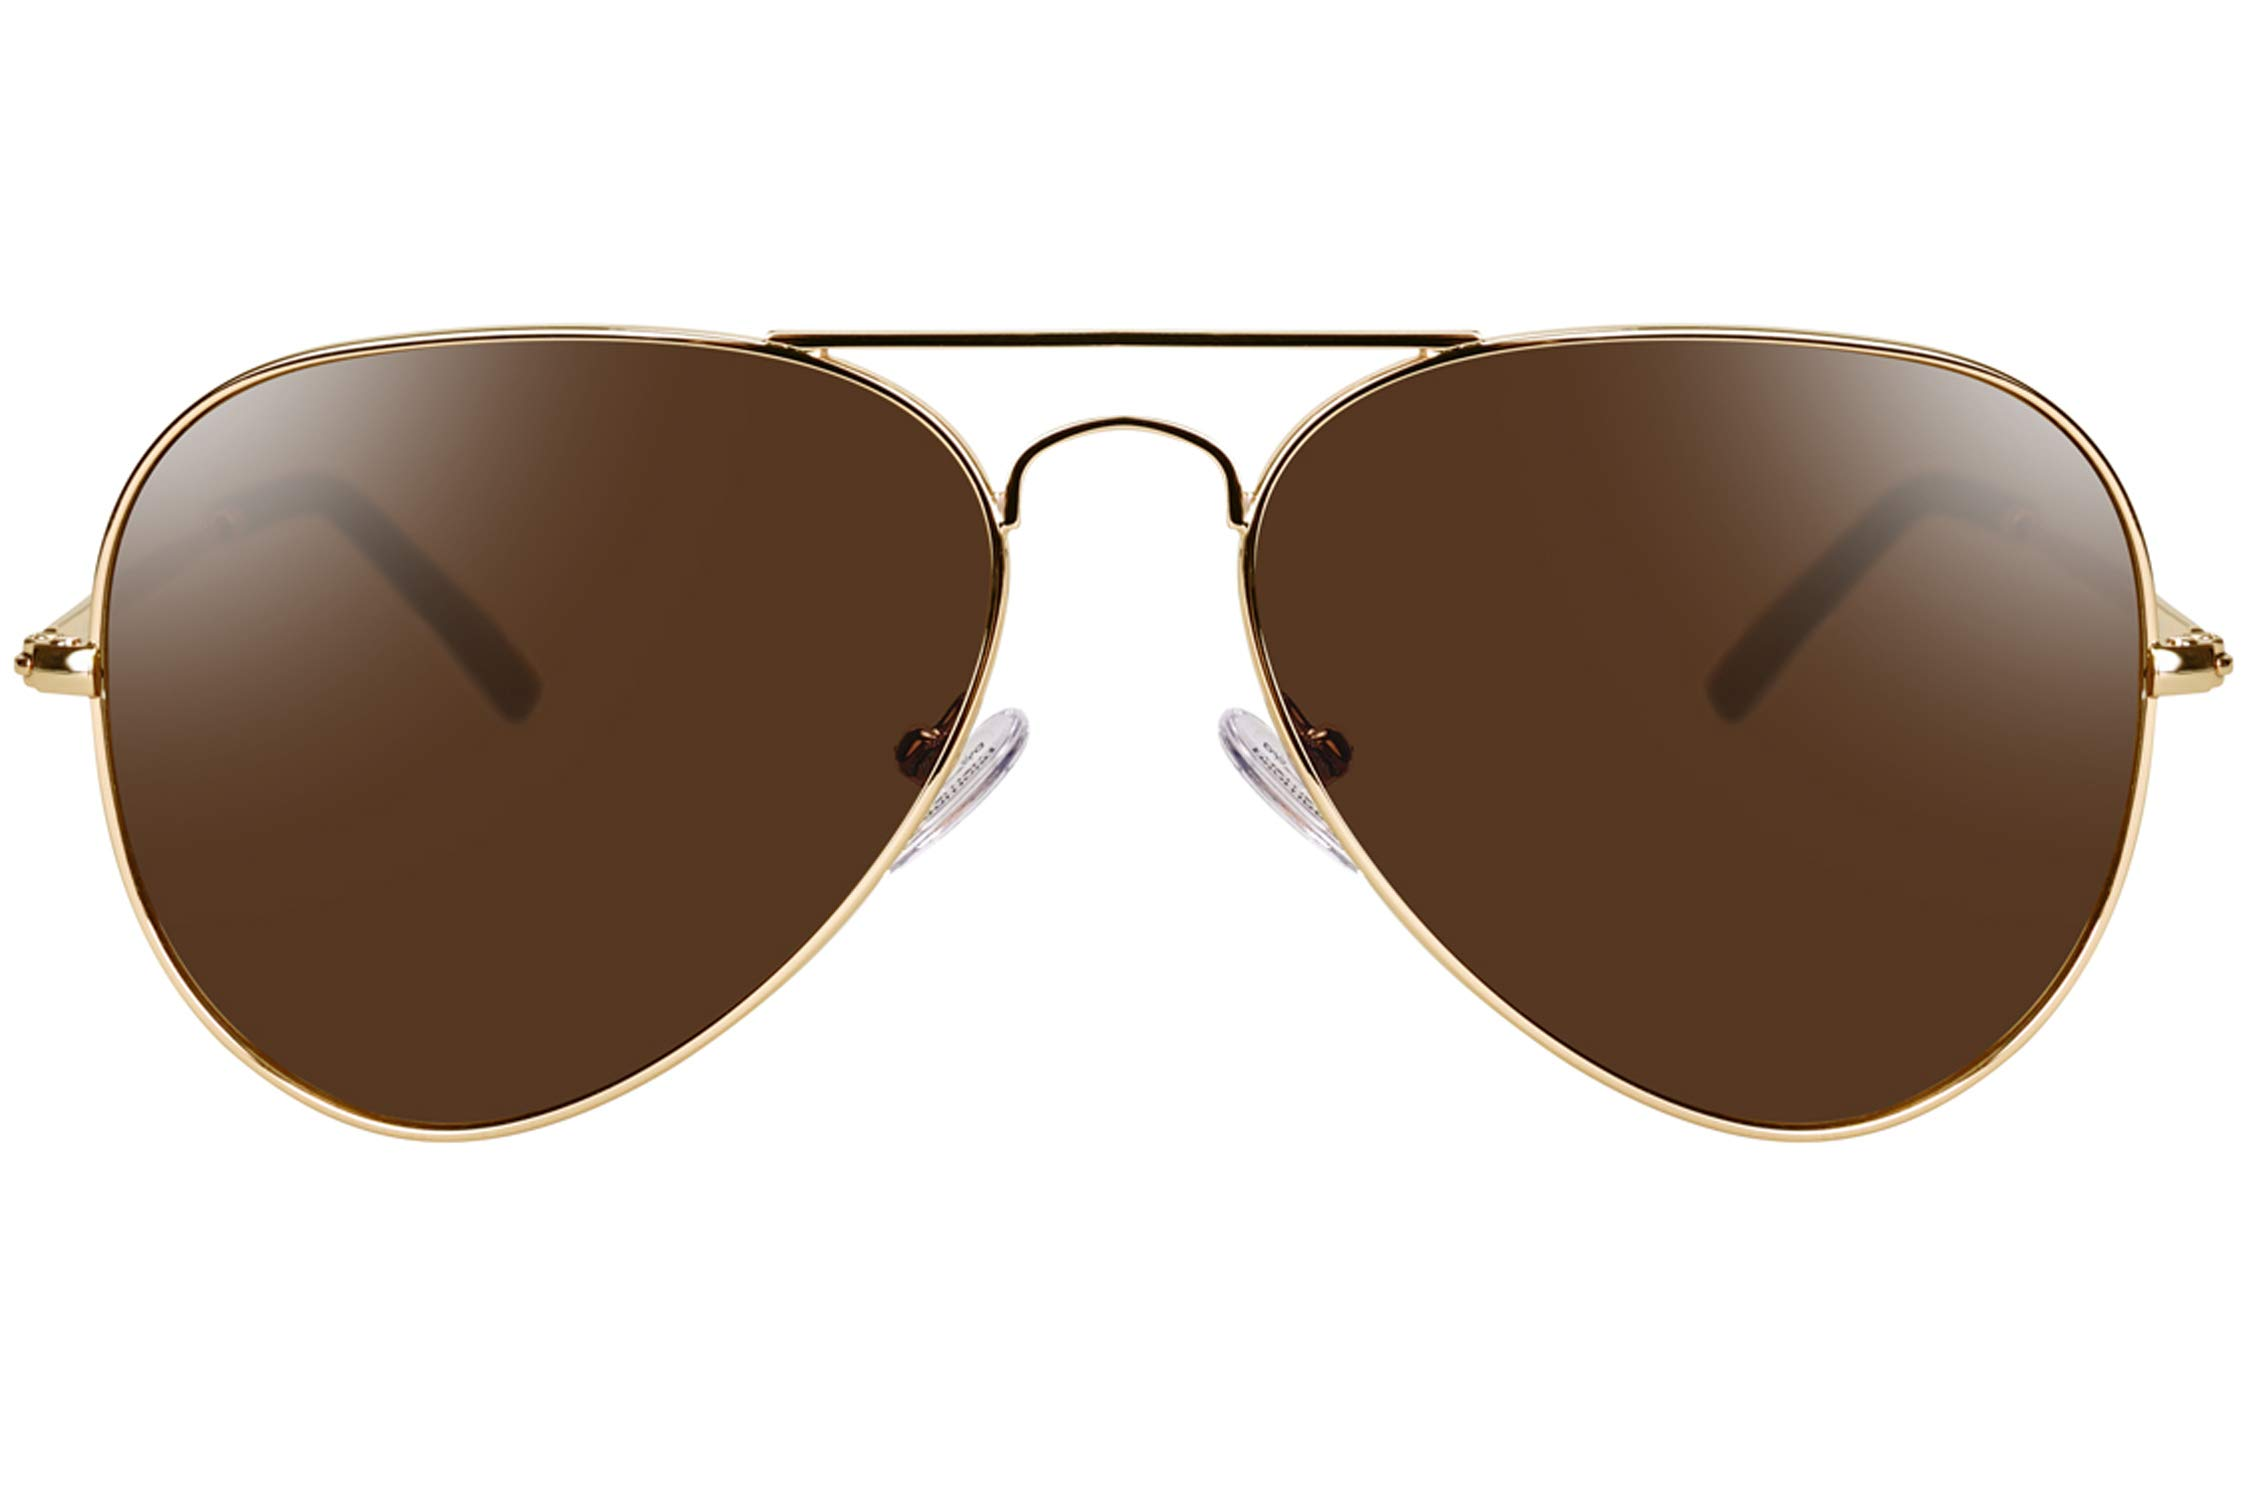 485ffbdb47 fawova 2019 Gafas de Sol Aviador Polarizadas Hombre, Gafas Sol Hombre  Polarizadas Aviador Unisex,